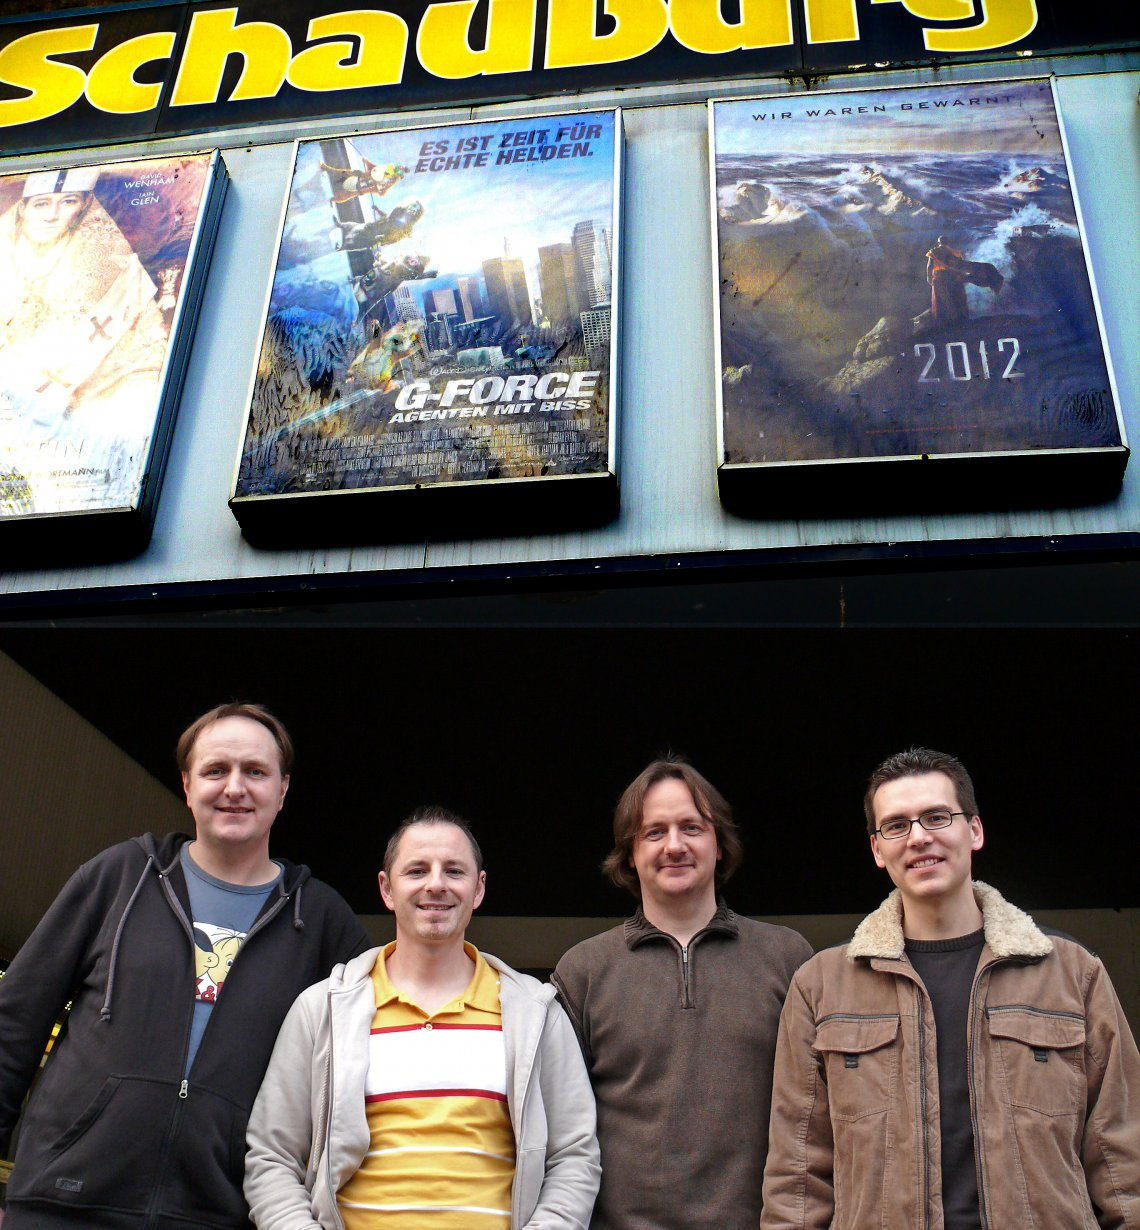 Der geheimnisvolle Filmclub BUIO OMEGA